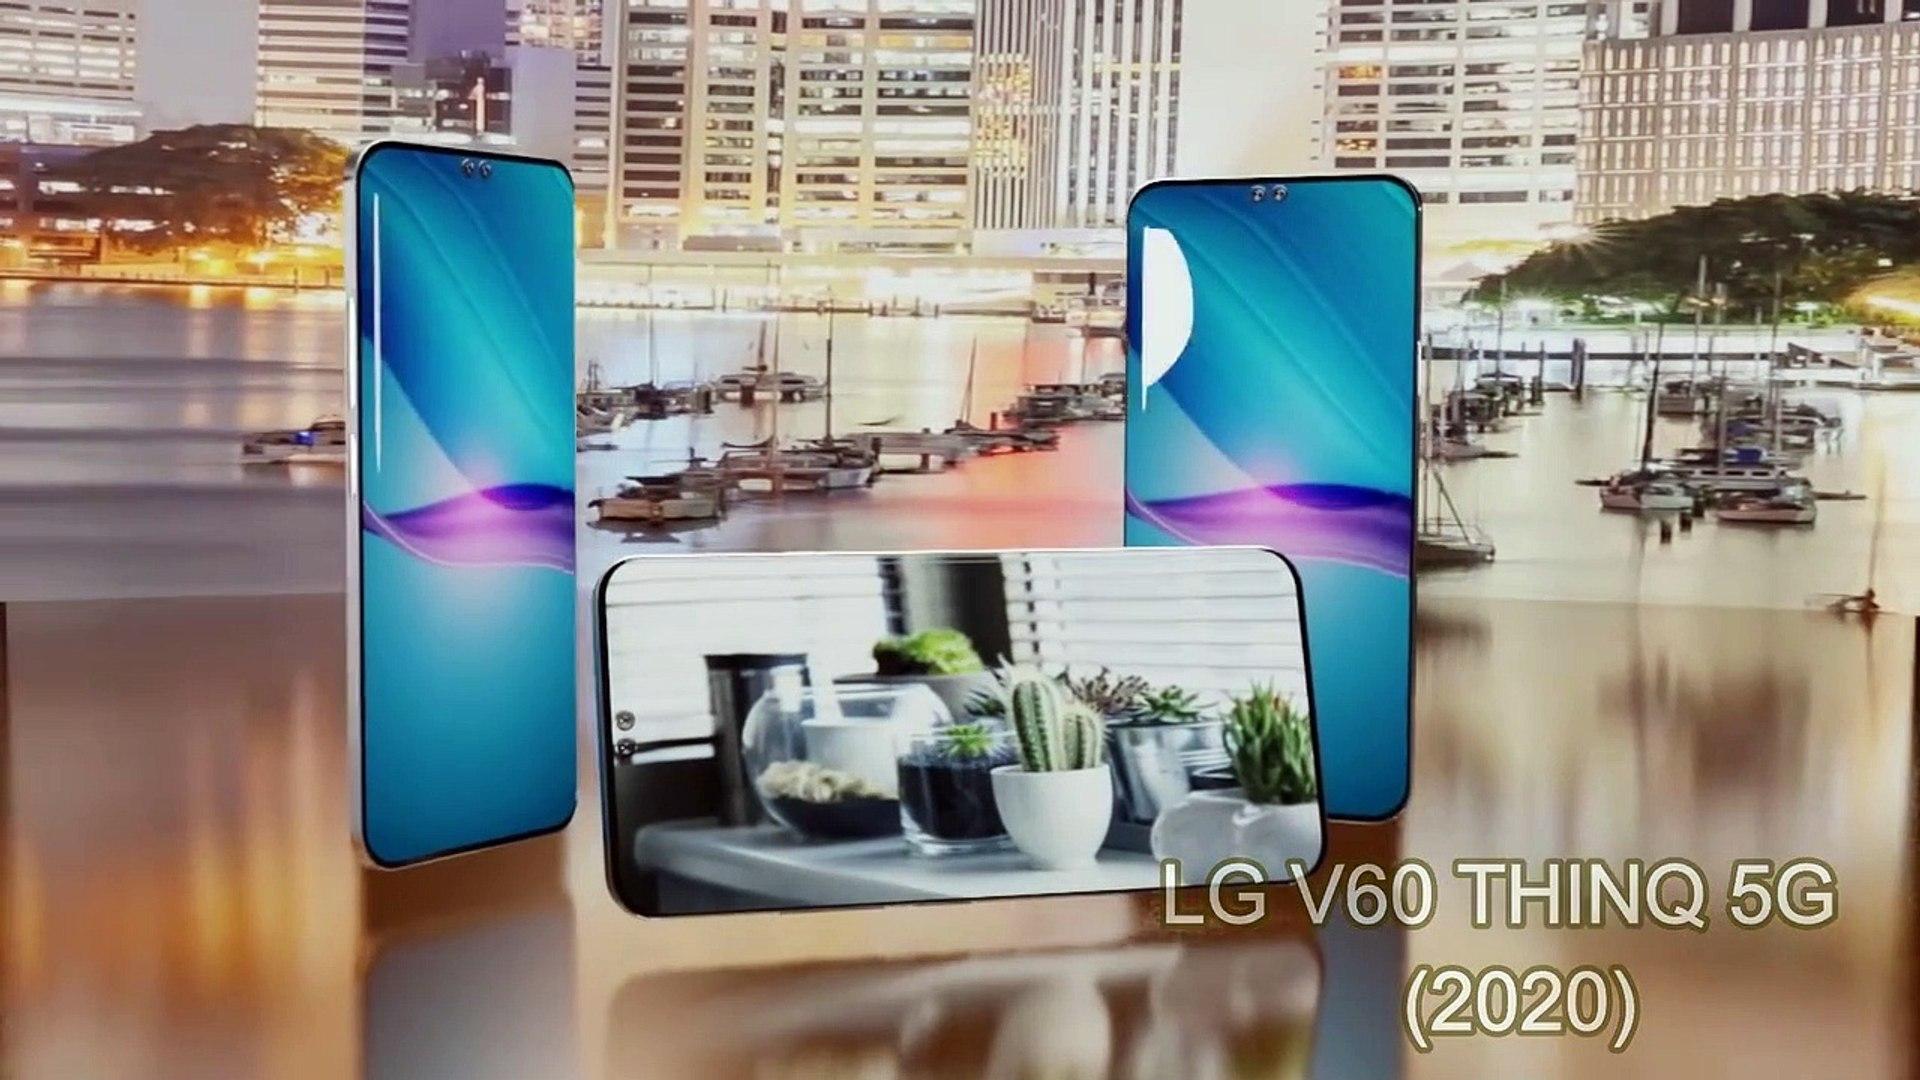 LG V60 ThinQ 5G (2020) FULL Introduction!!!